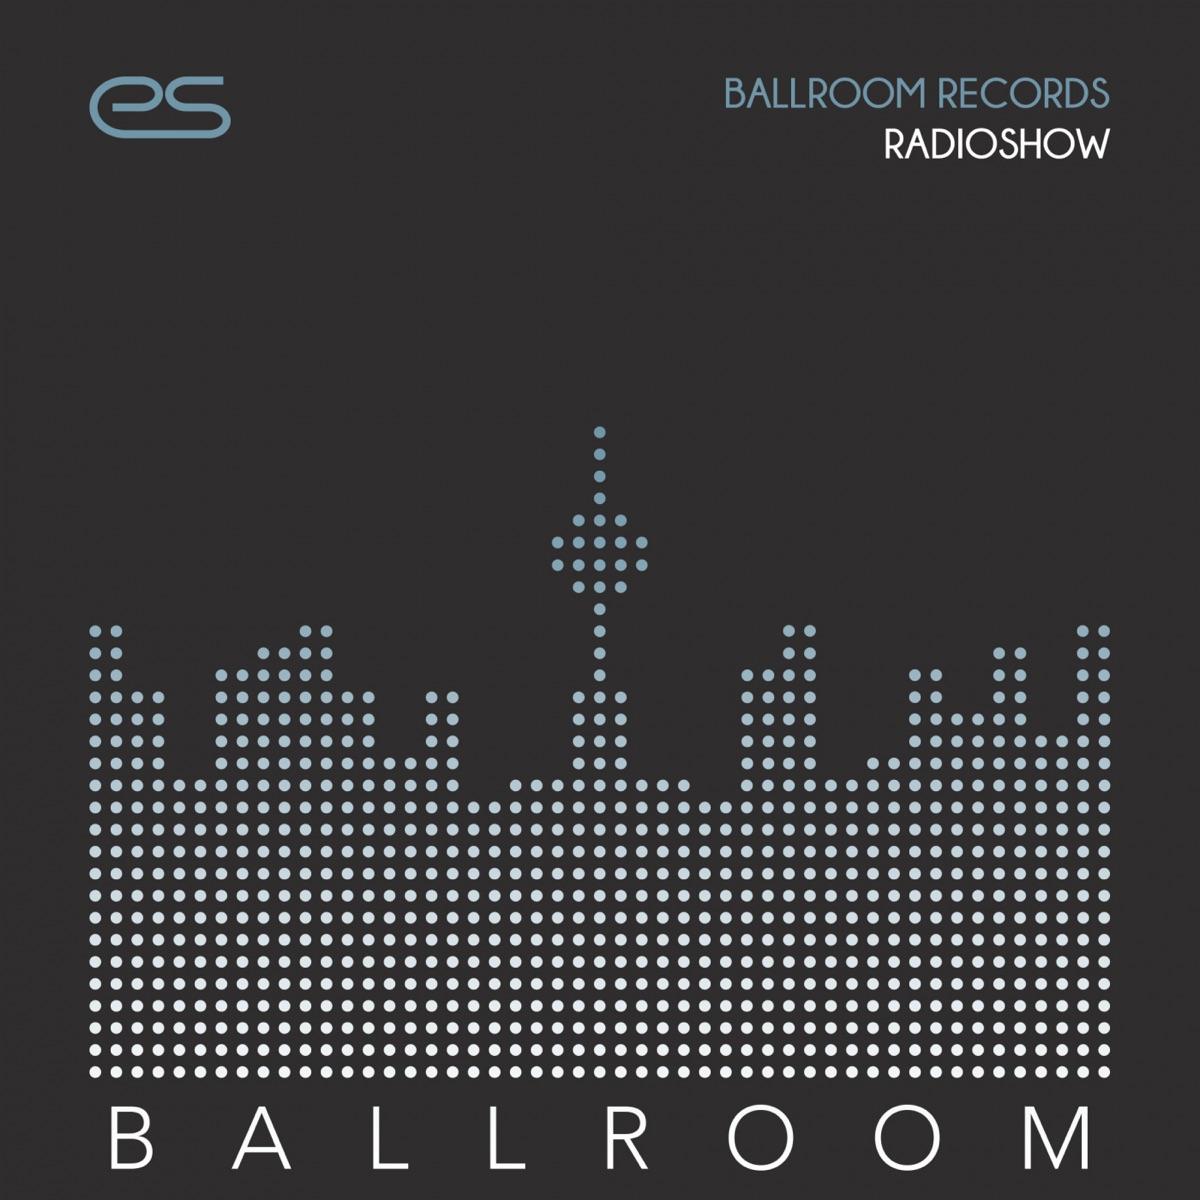 Ballroom Records Radioshow